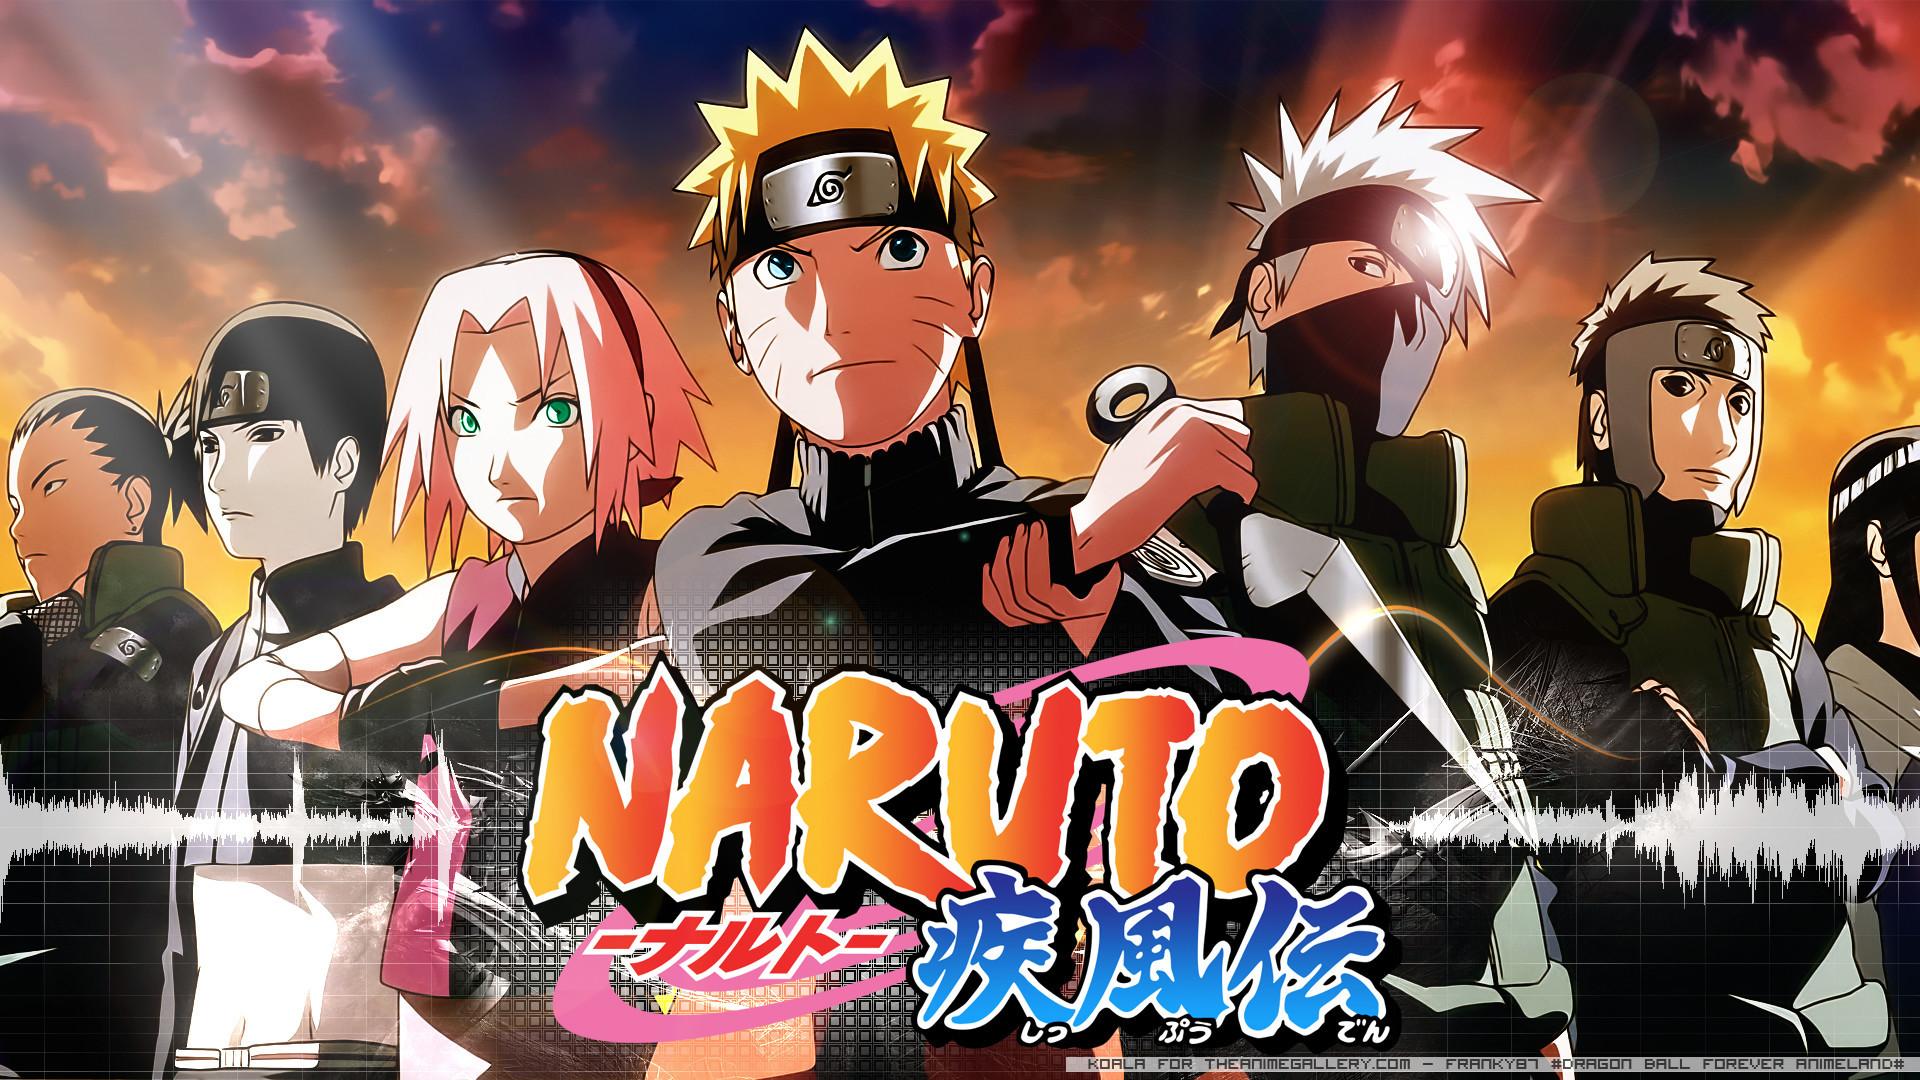 80 Naruto 1080P Wallpapers on WallpaperPlay